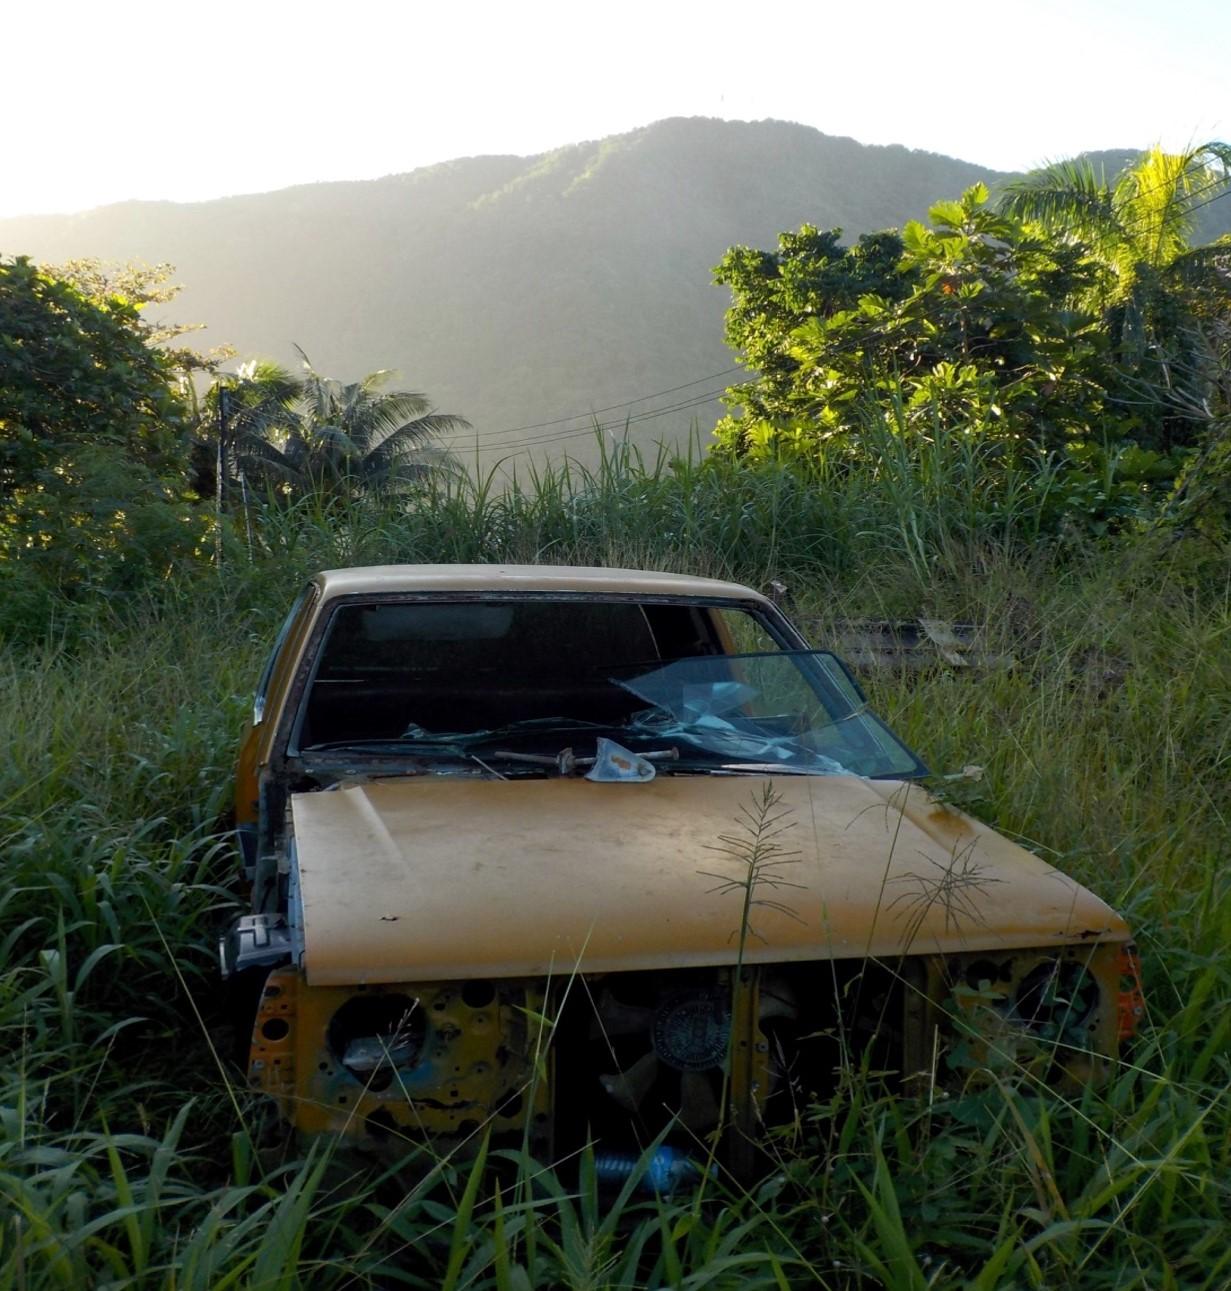 rusted car in Tutuila